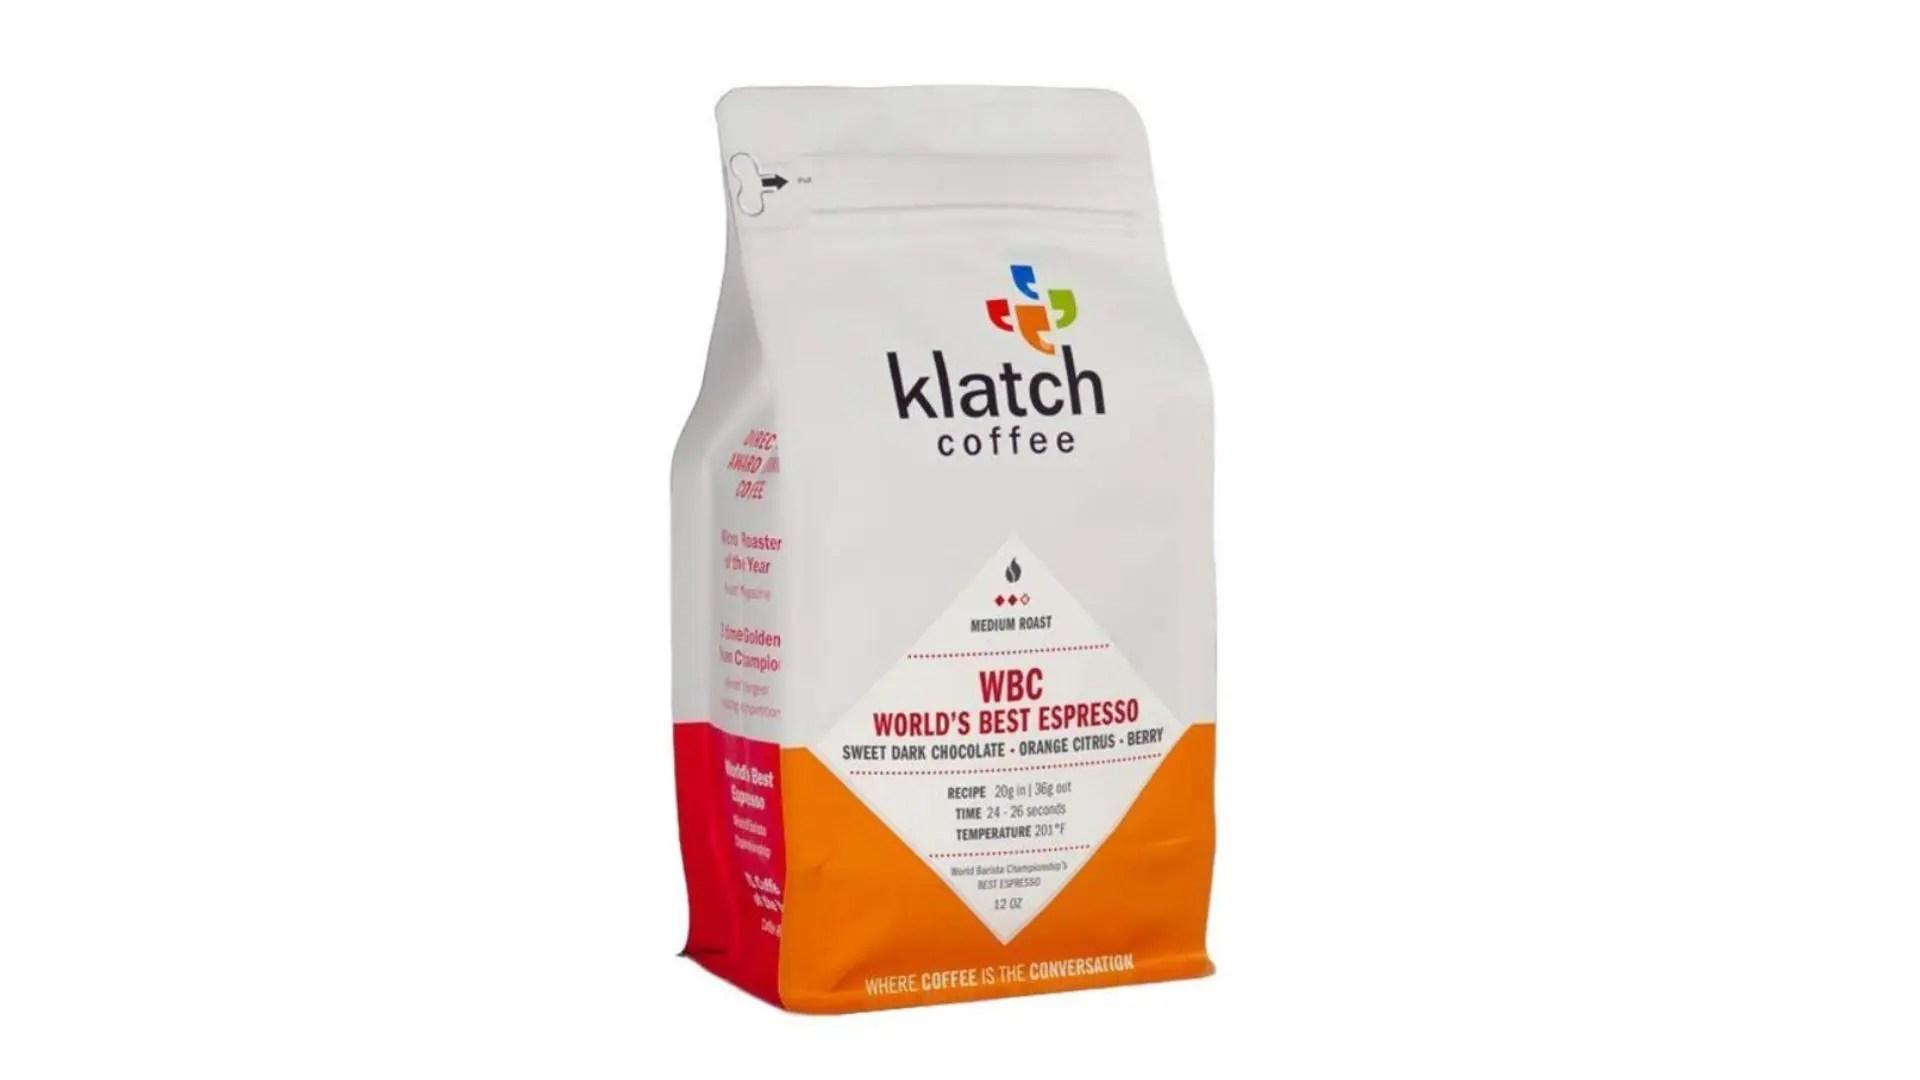 Klatch Coffee World's Best Espresso